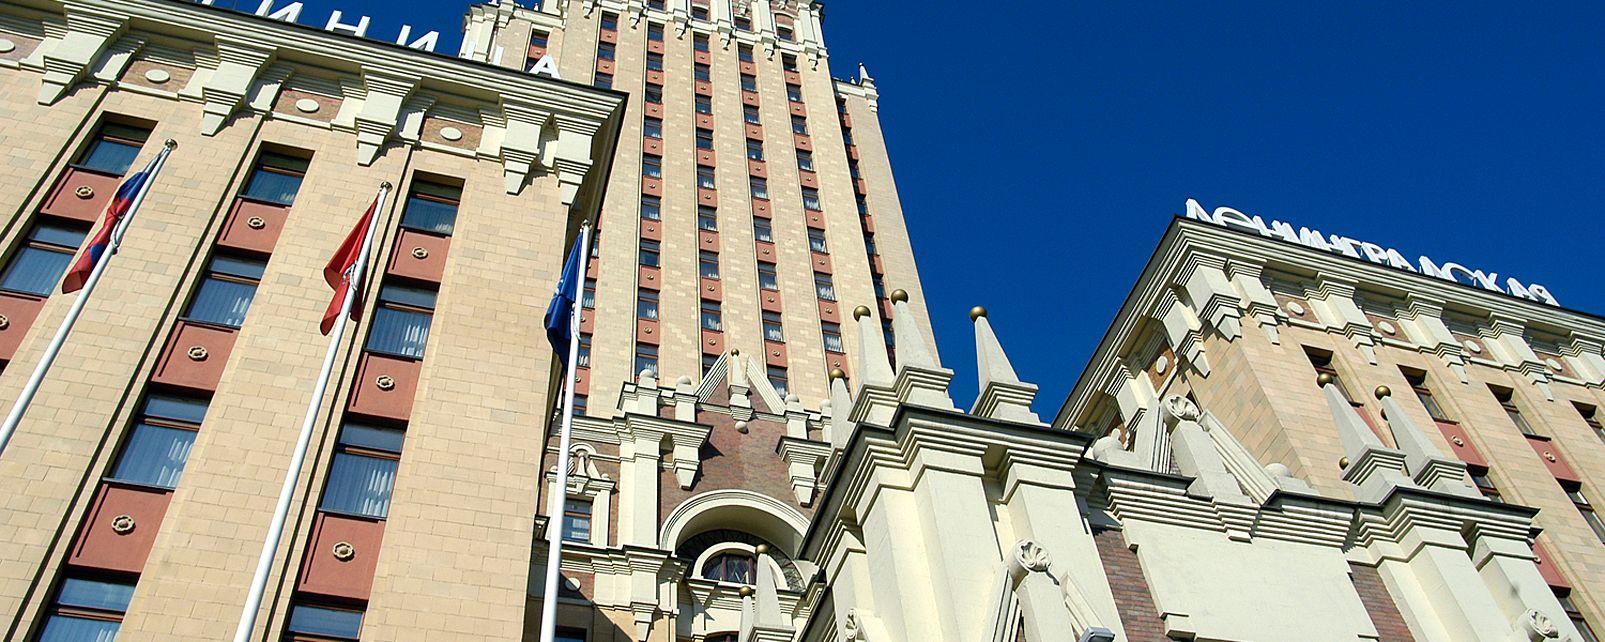 Hotel Hilton Leningradskaya